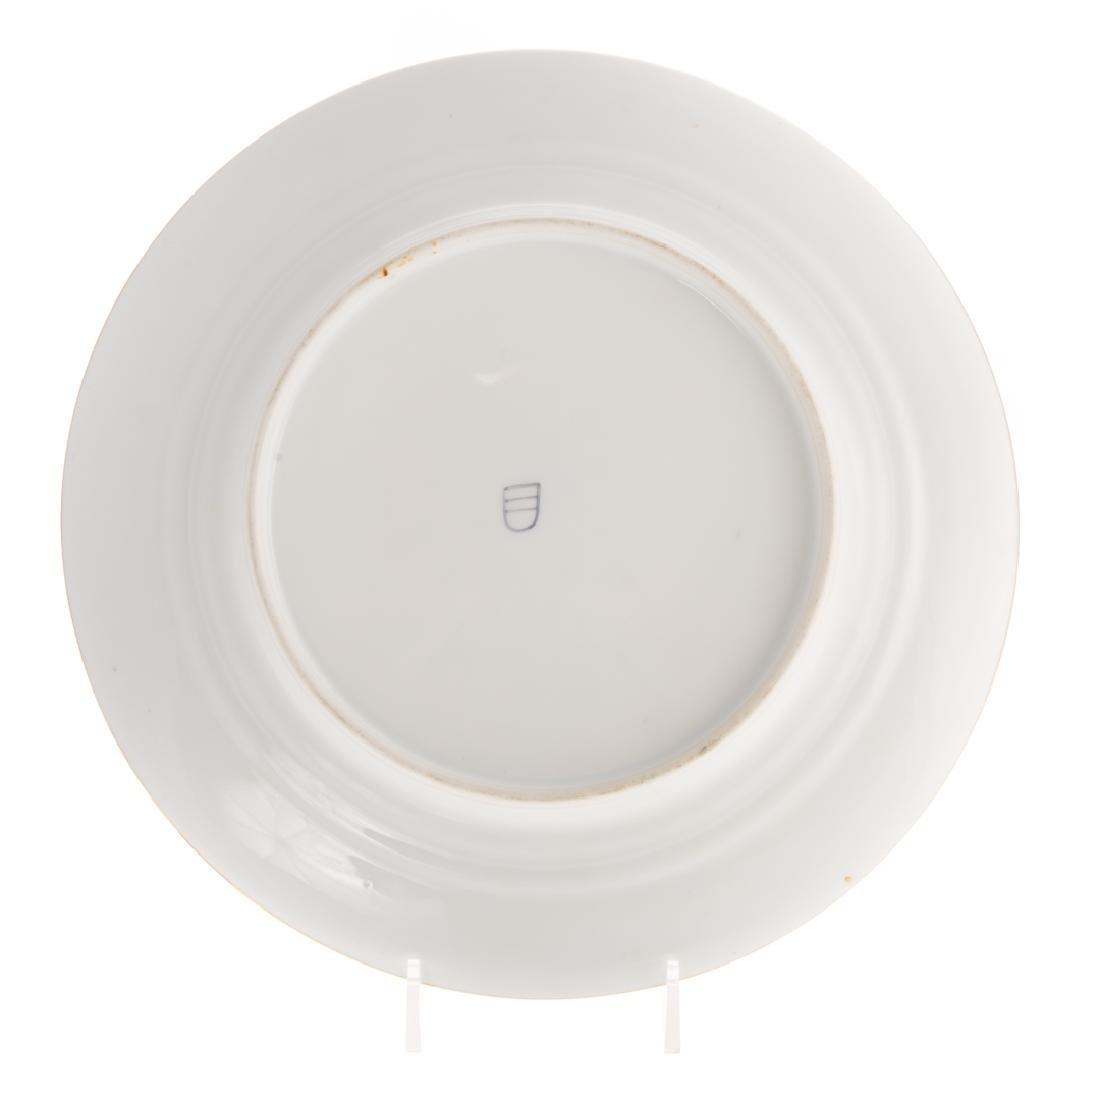 12 Vienna porcelain gilt & enamel decorated plates - 5